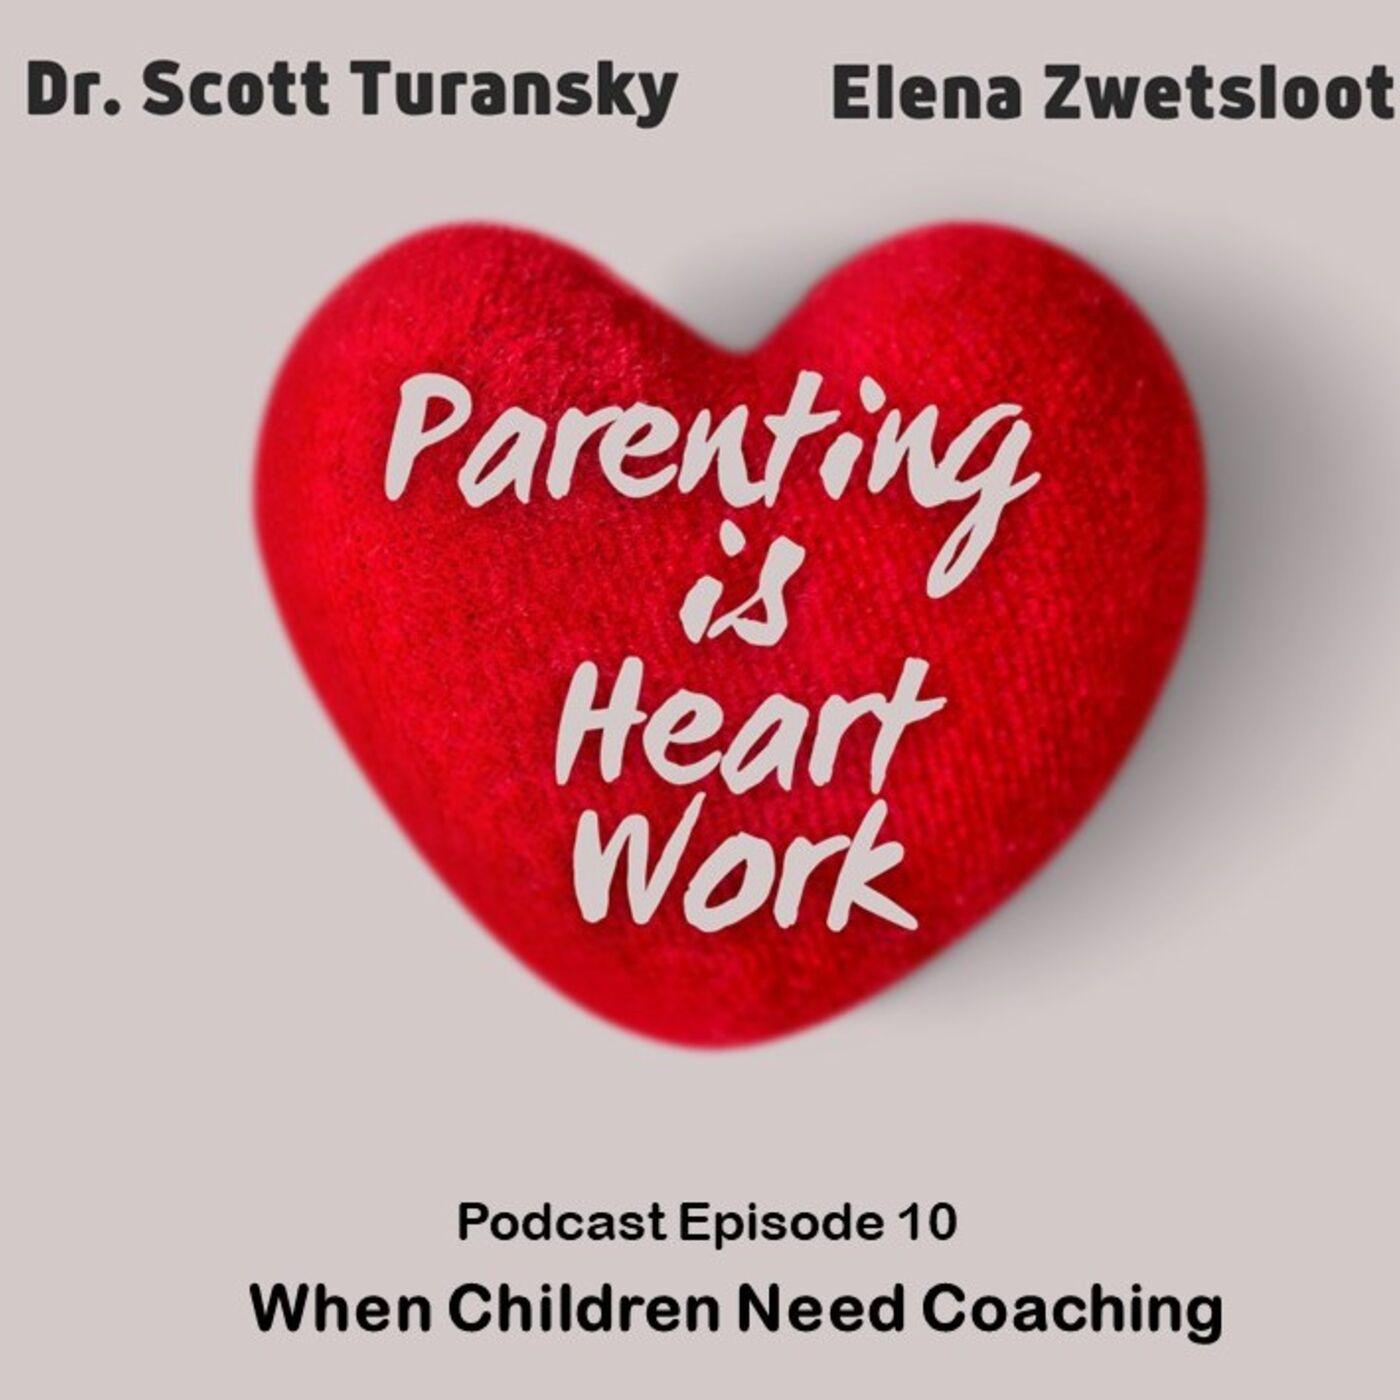 9. When Children Need Coaching